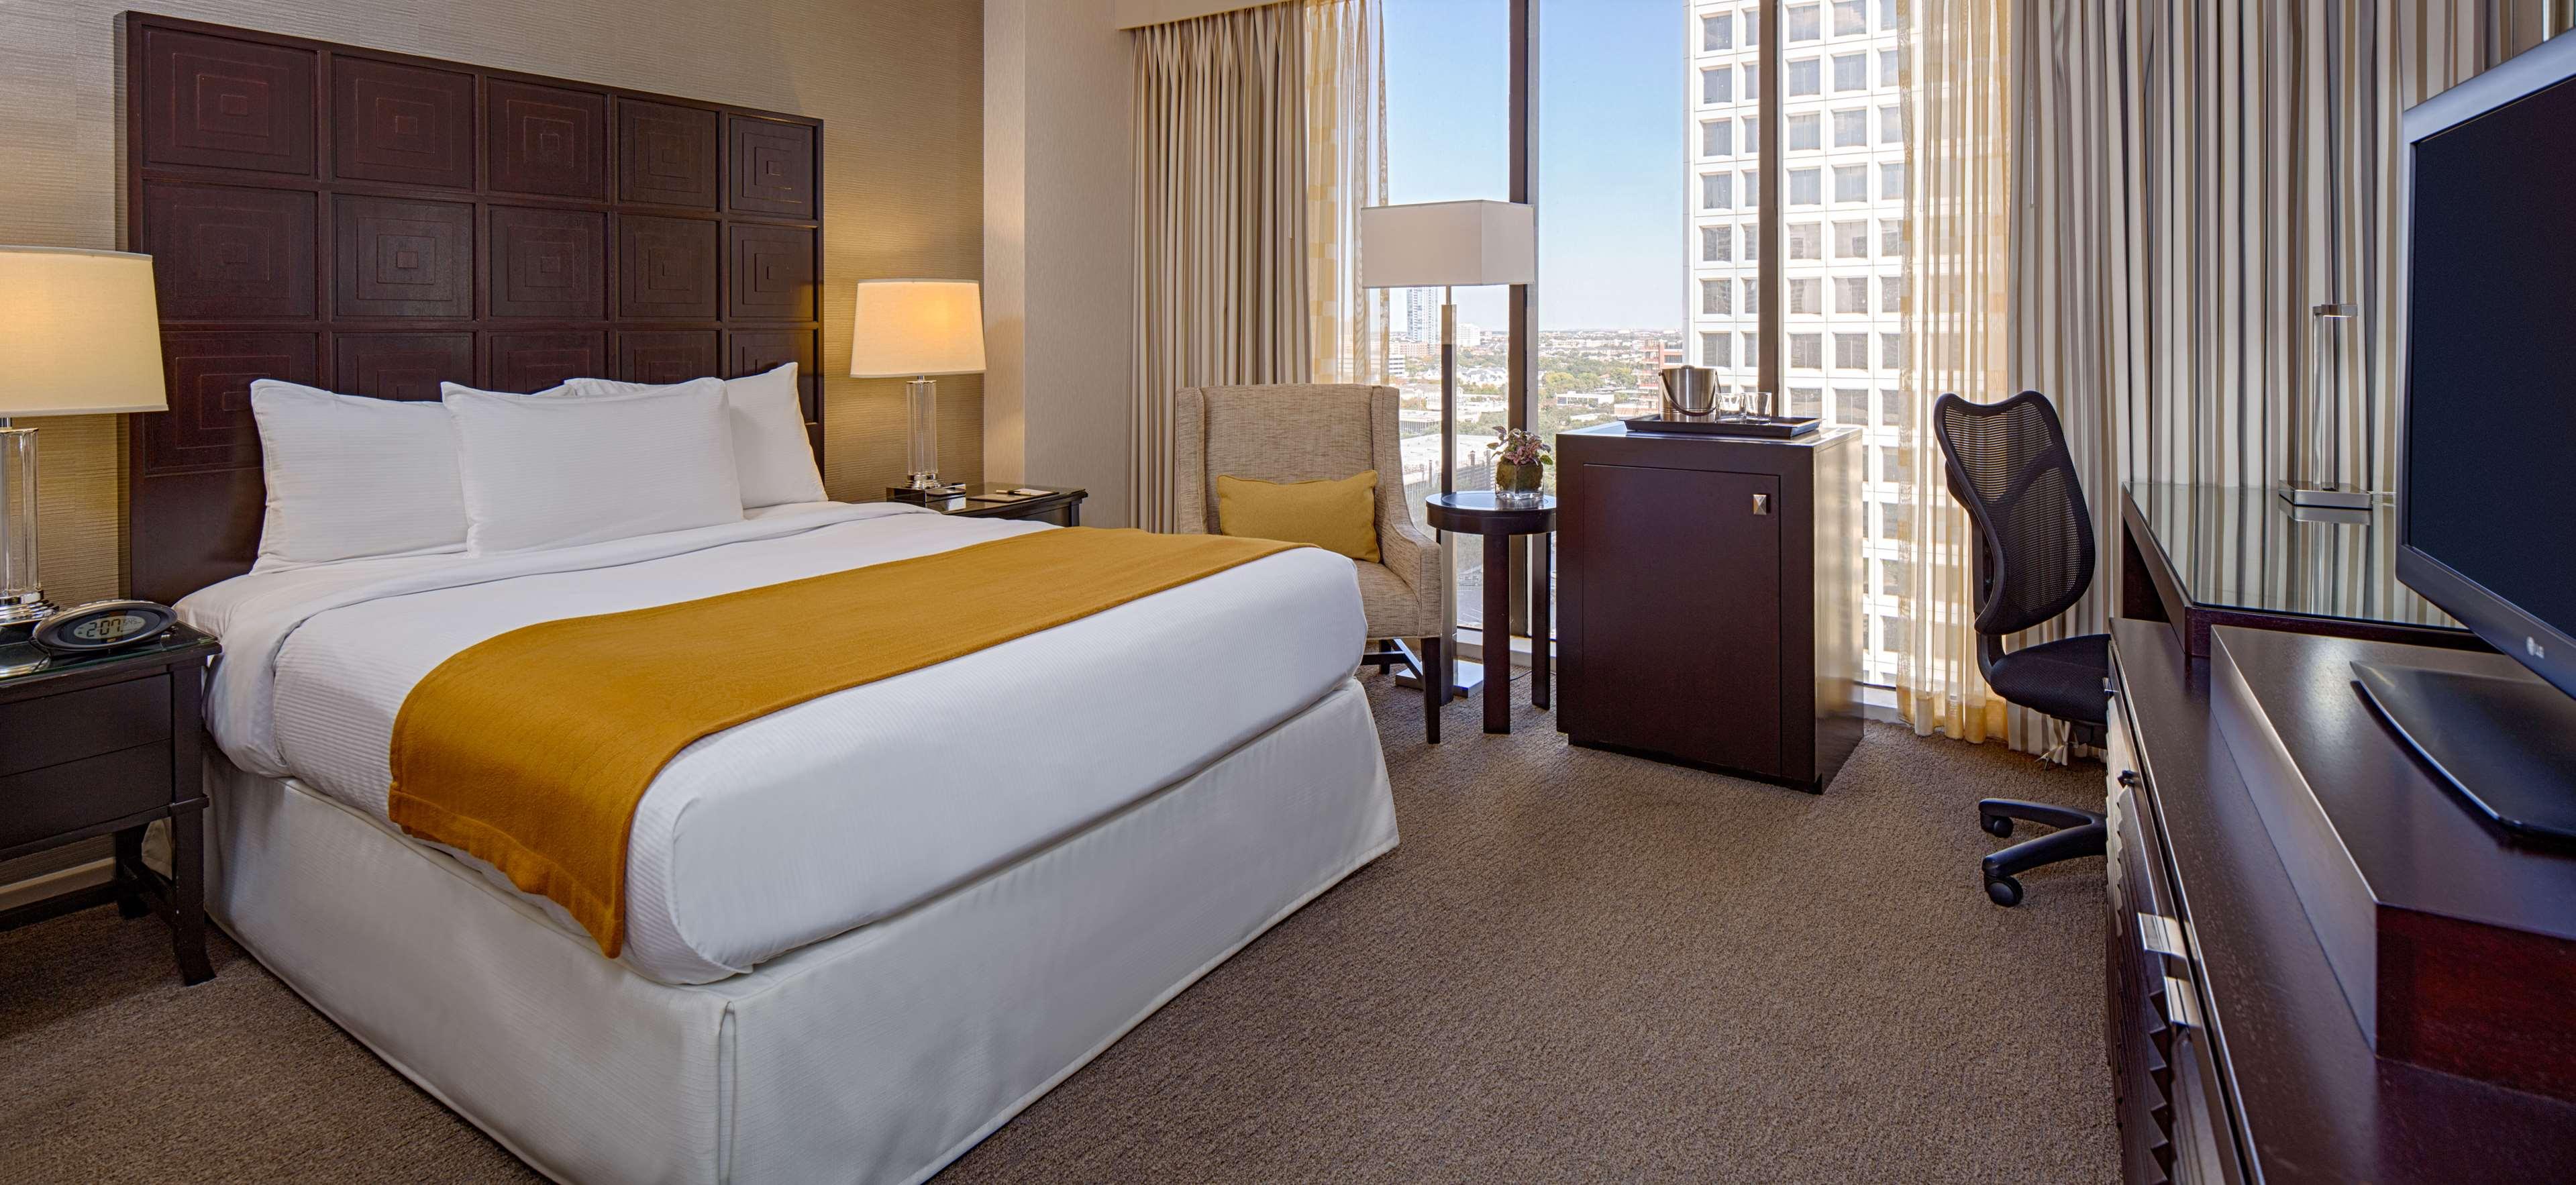 DoubleTree by Hilton Hotel Houston - Greenway Plaza image 22